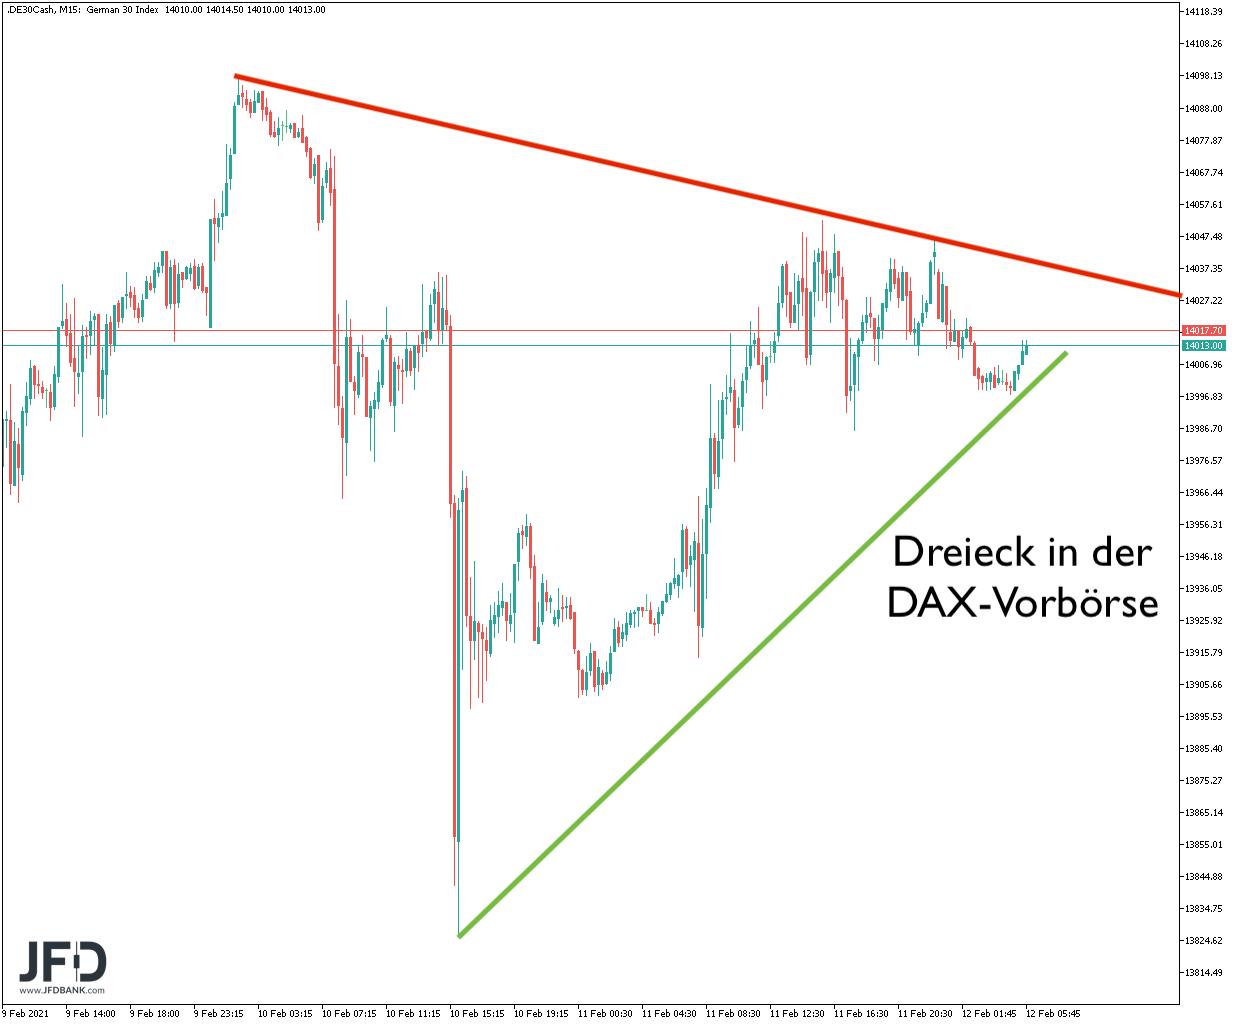 Dreieck in DAX-Vorbörse am 12.02.2021